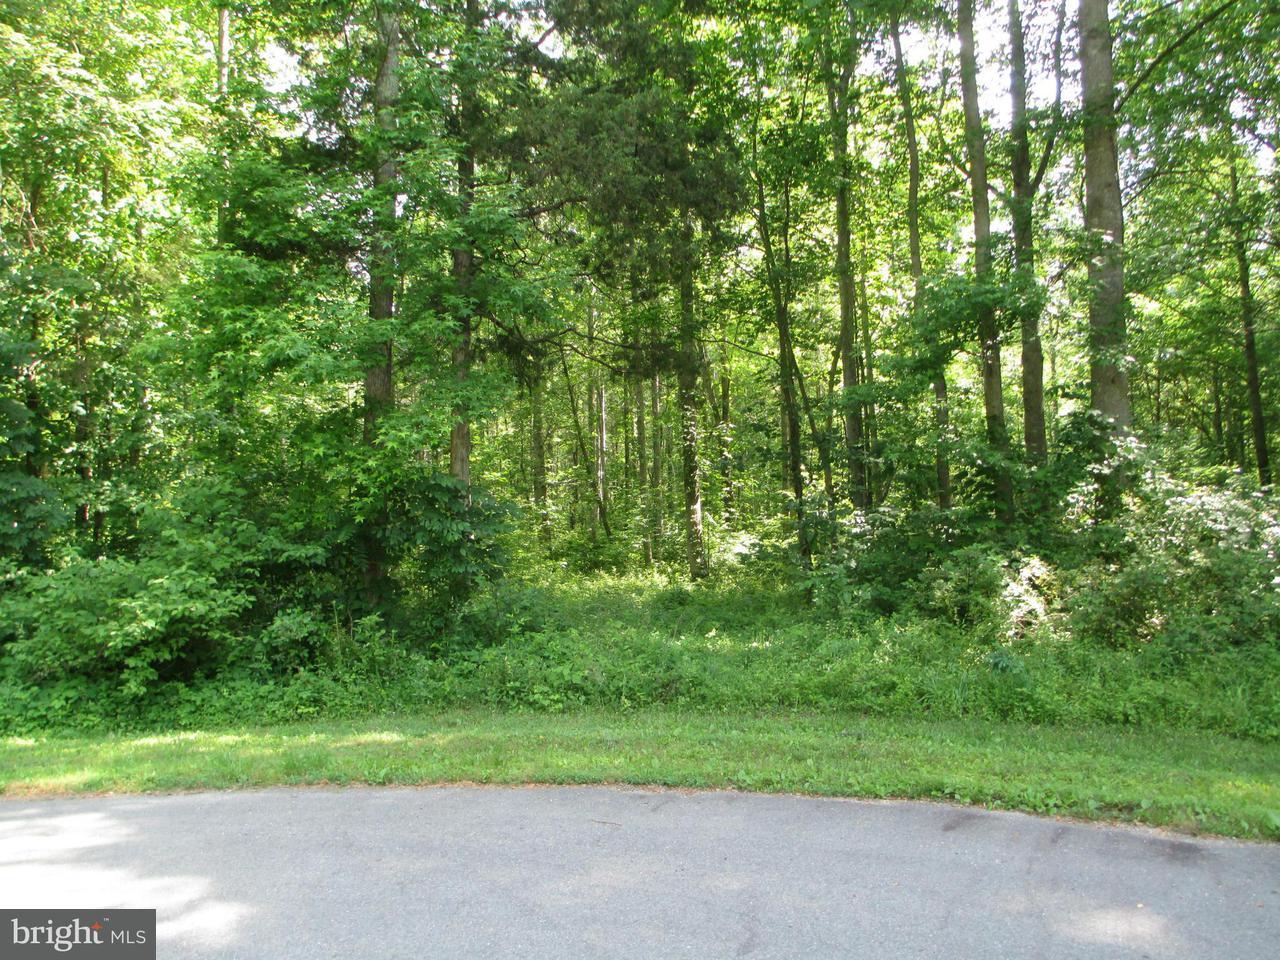 Land for Sale at Slasher Pl Mineral, Virginia 23117 United States